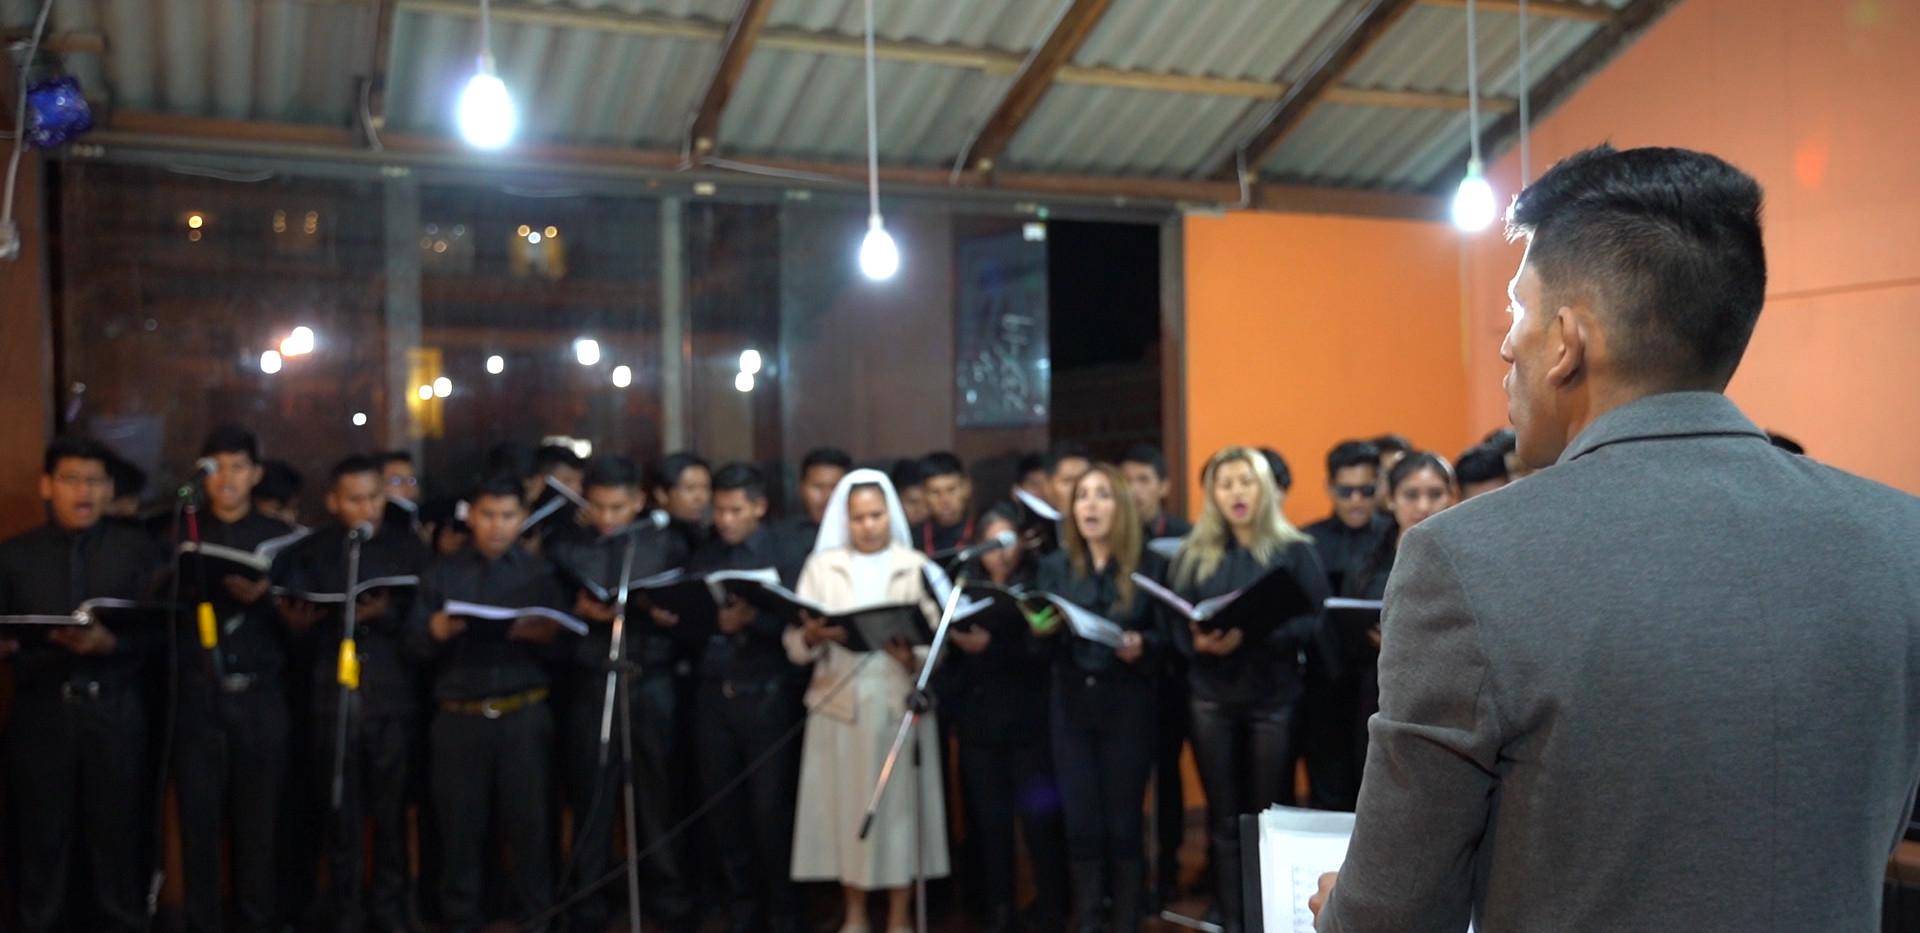 coro academia milan